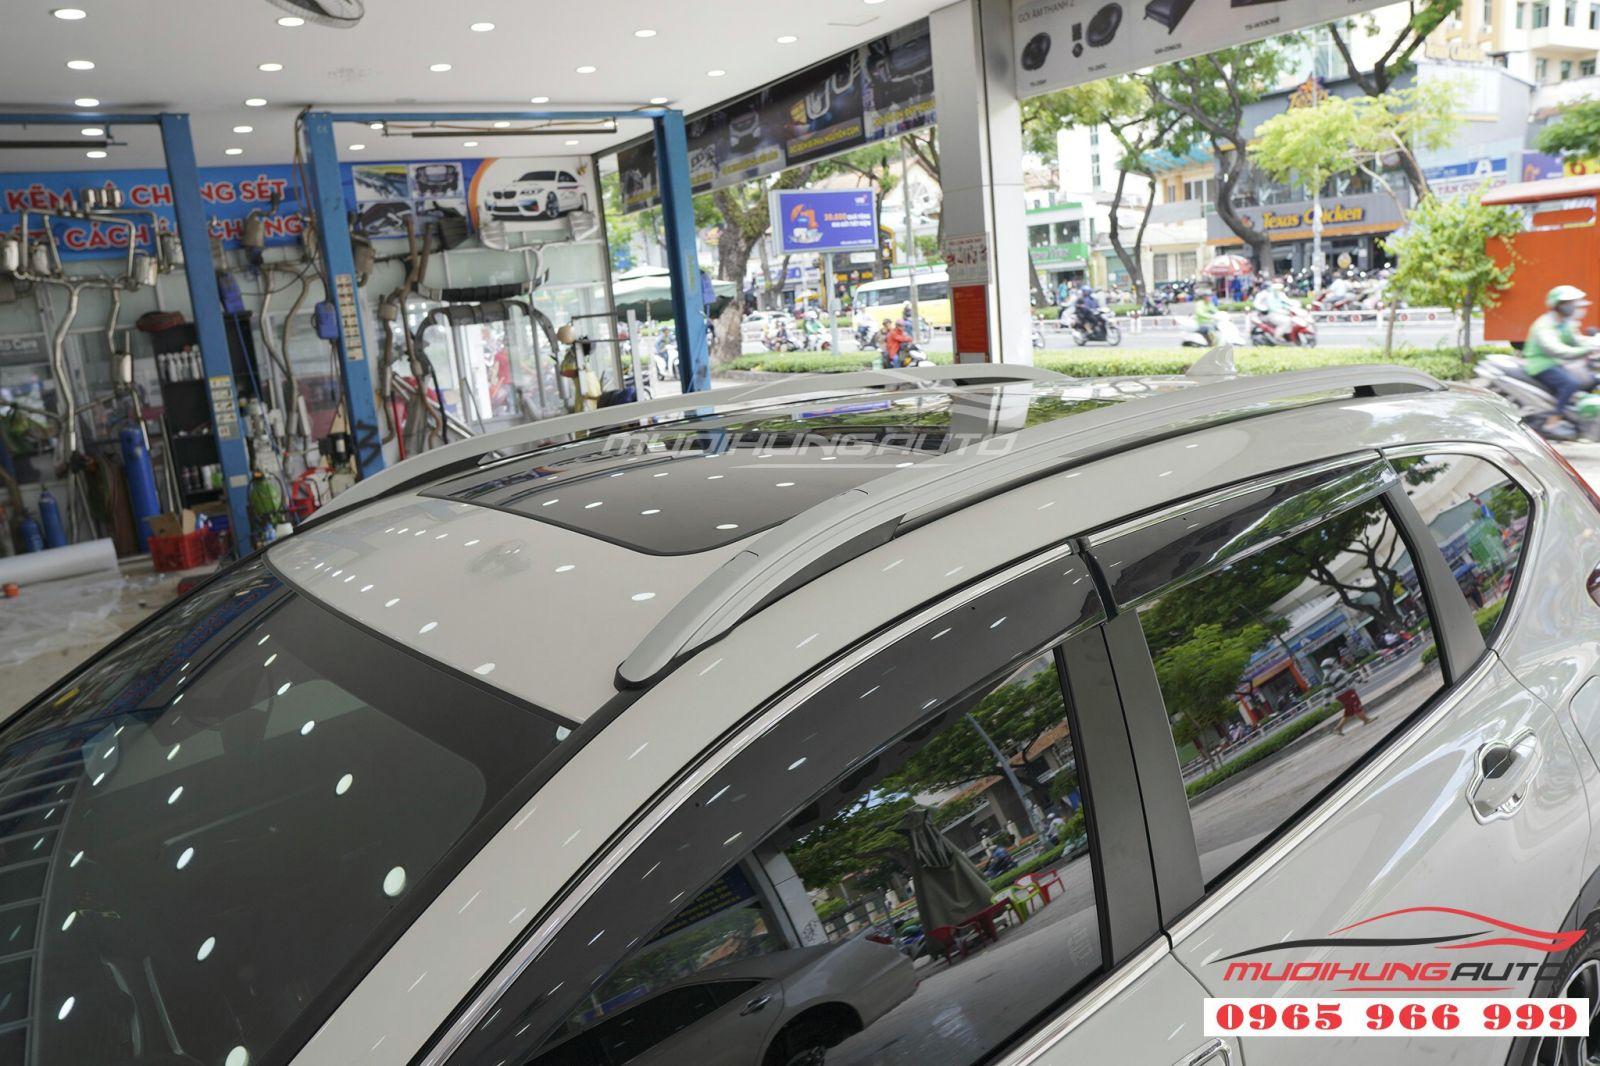 Lắp thanh giá nóc cao cho Honda CRV 2019 giá rẻ 04